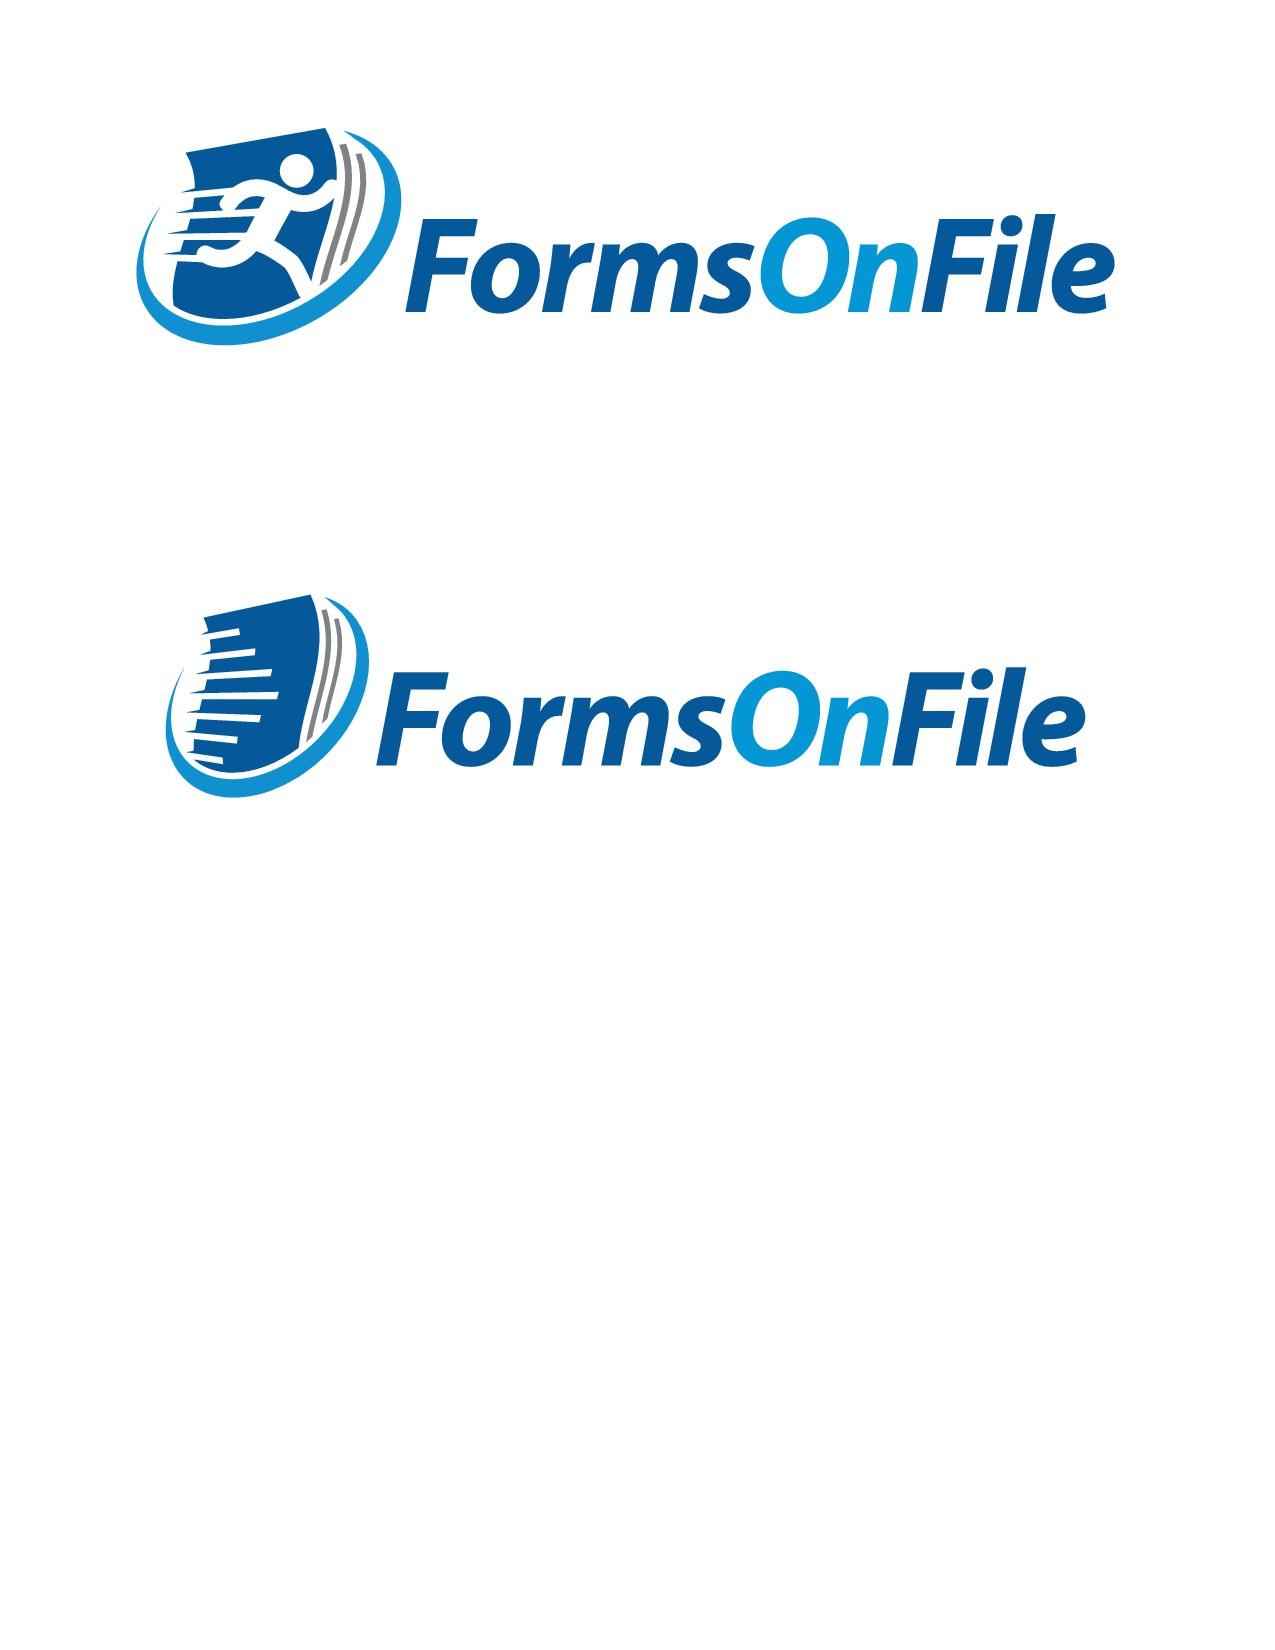 Let your best ideas loose for FormsOnFile.com!